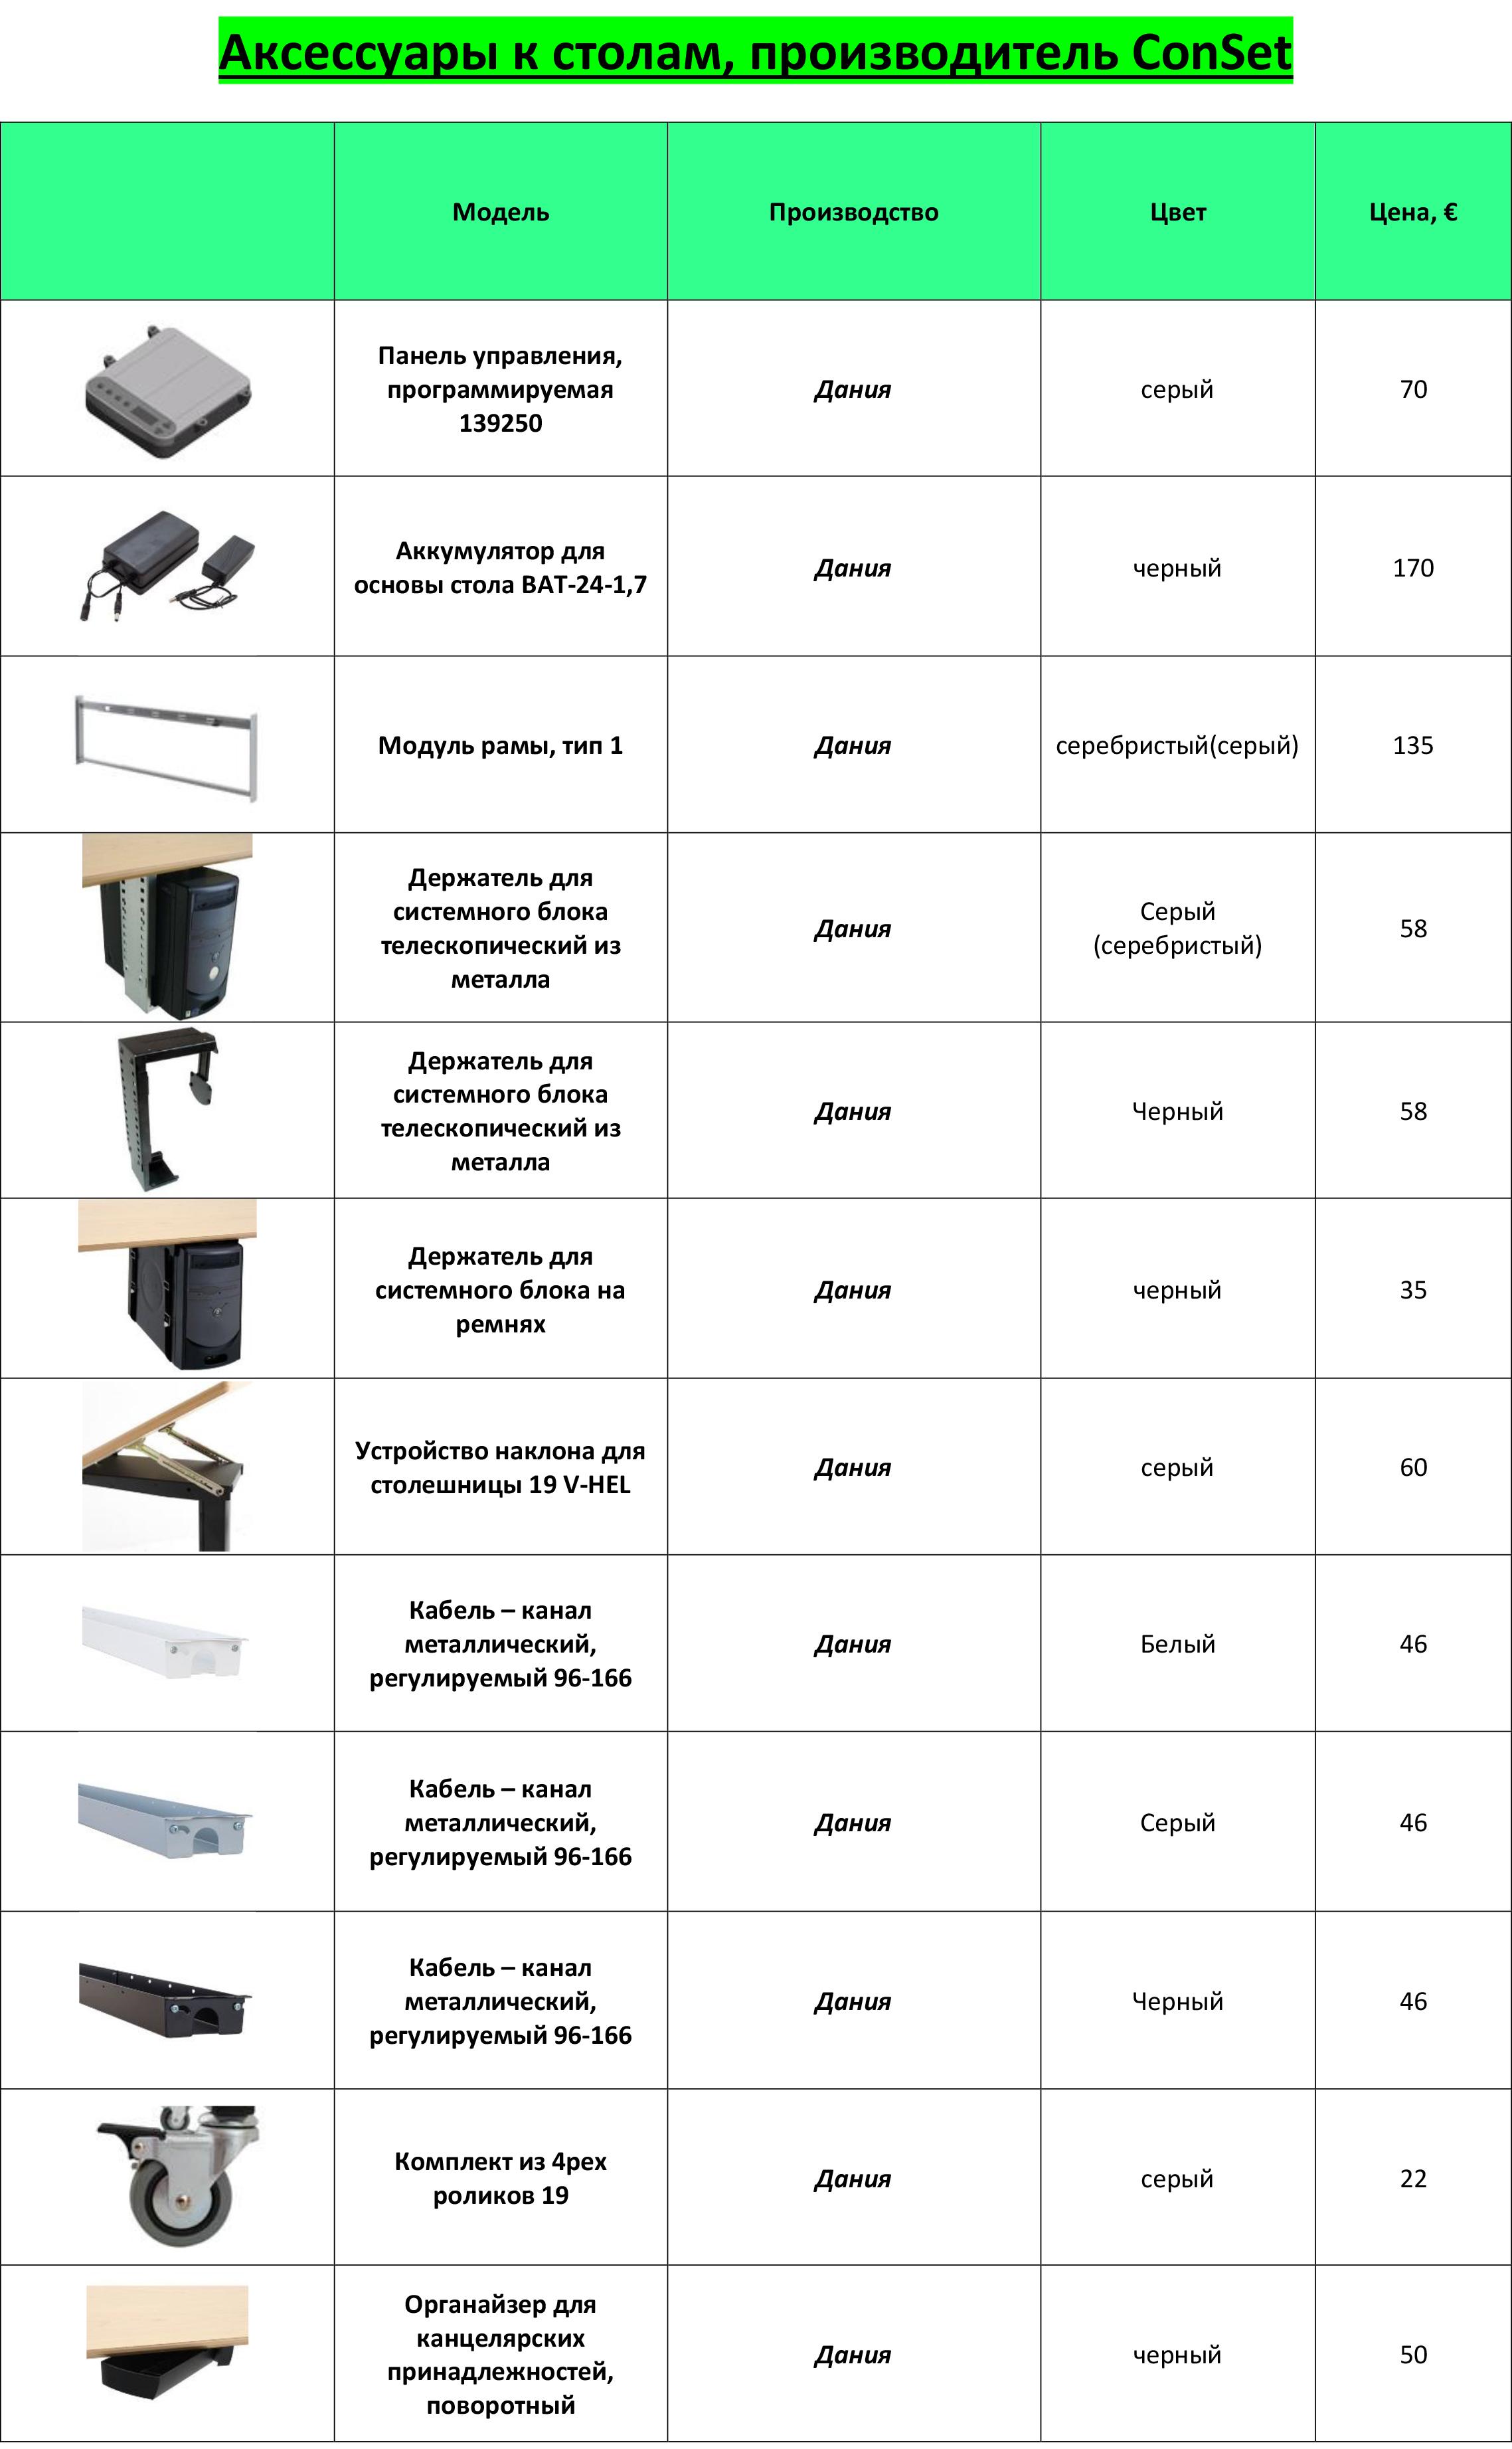 9_accessories_conset.jpg